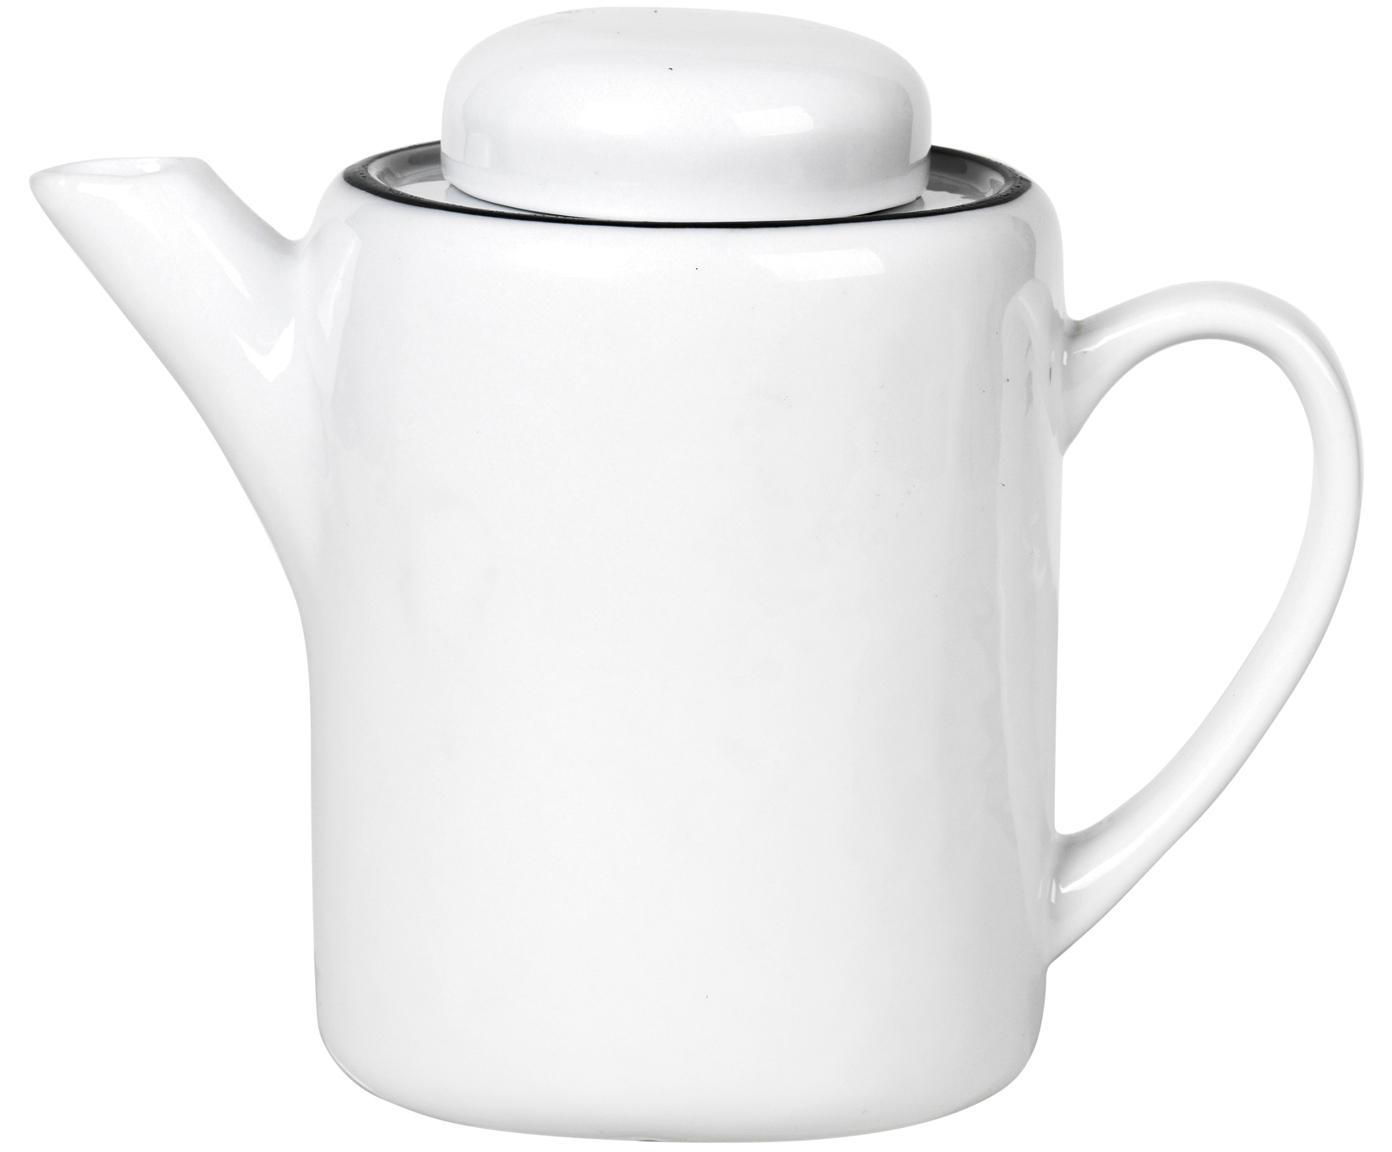 Teiera artigianale Salt, Porcellana, Bianco, nero, 1.3 L